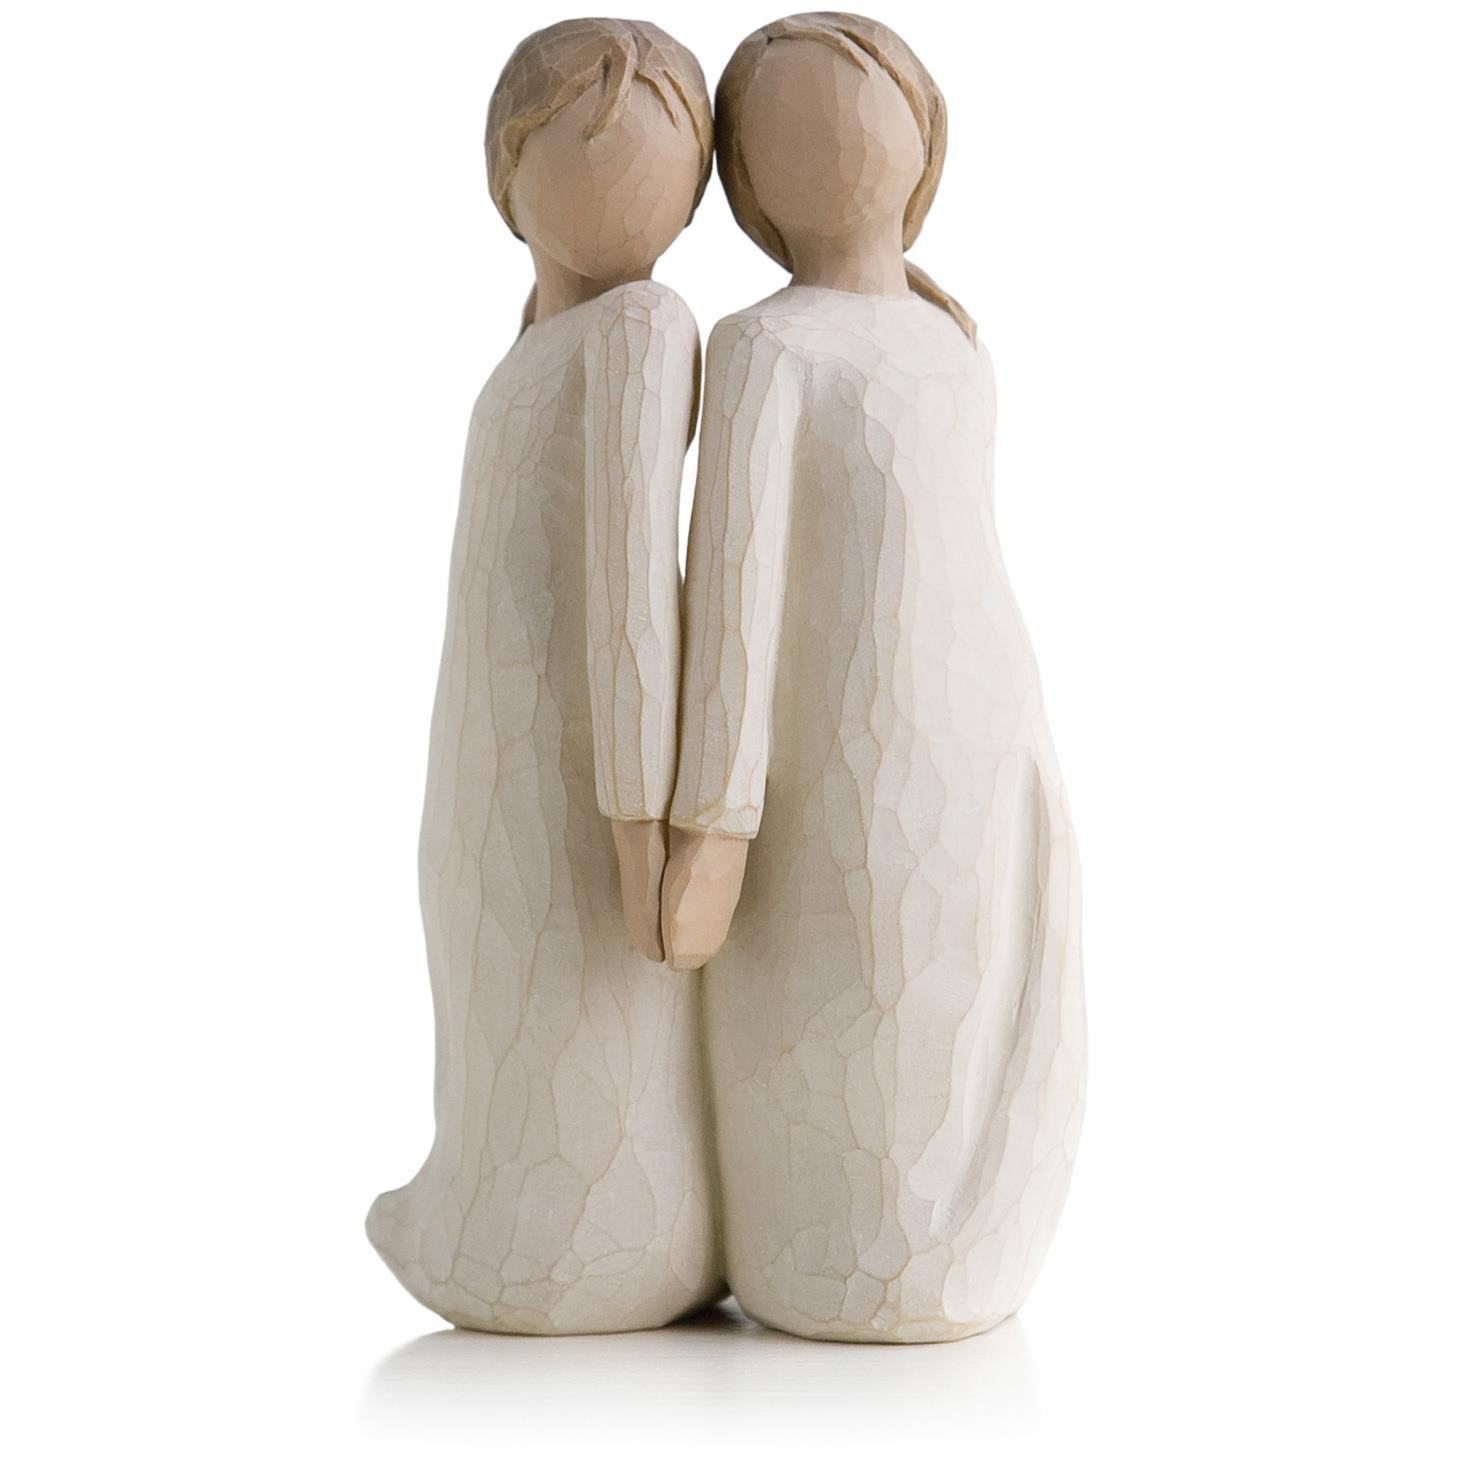 Willow tree 174 two alike twins figurine figurines hallmark